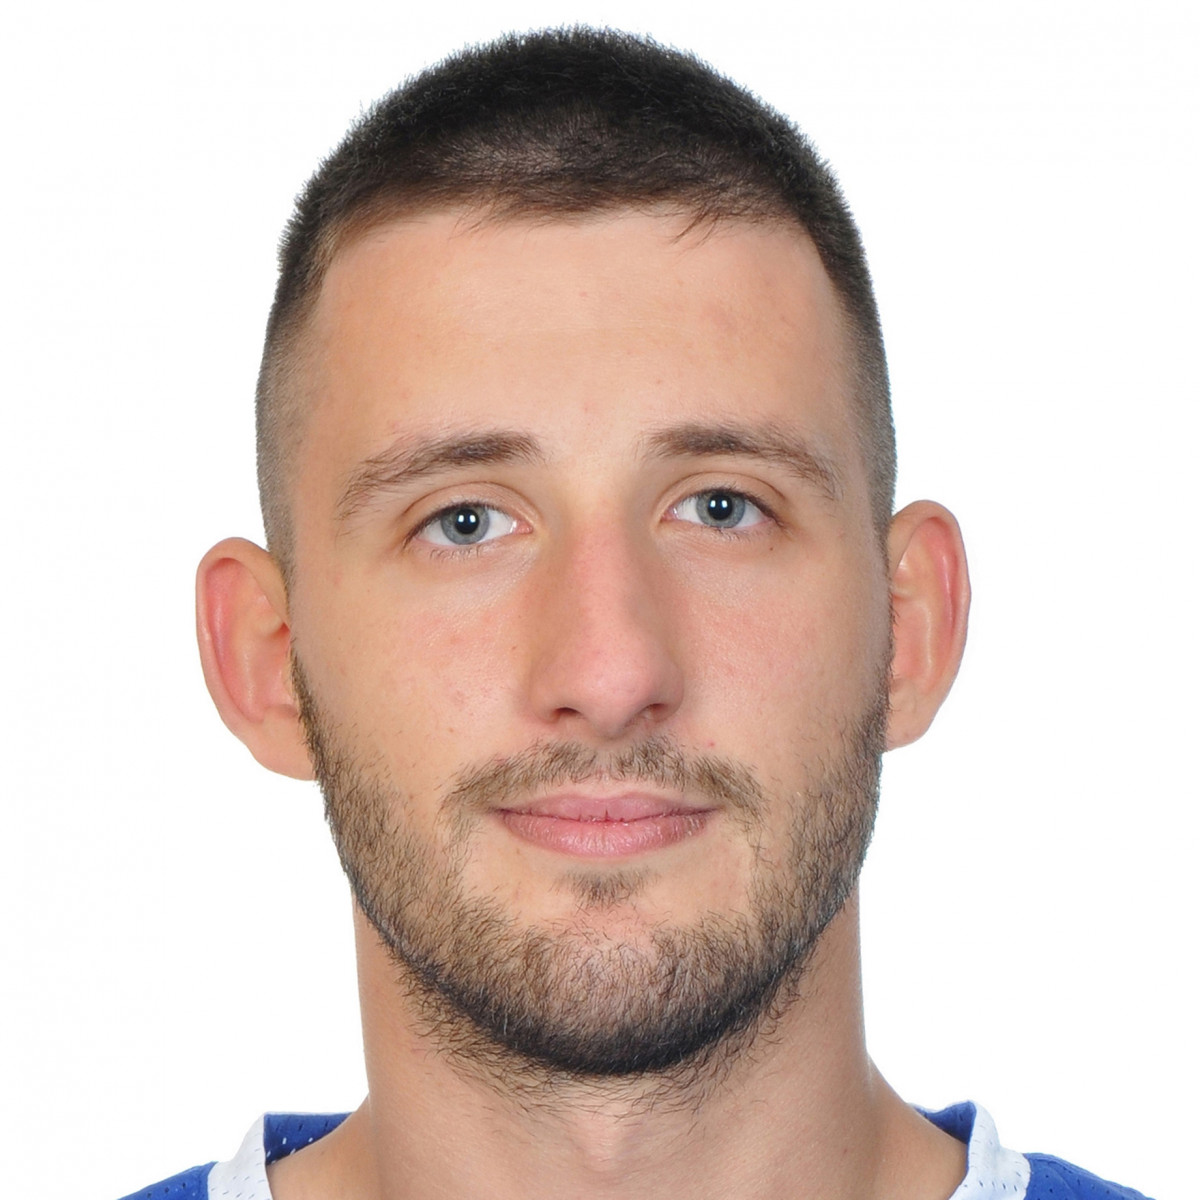 Hubert Kruszczynski